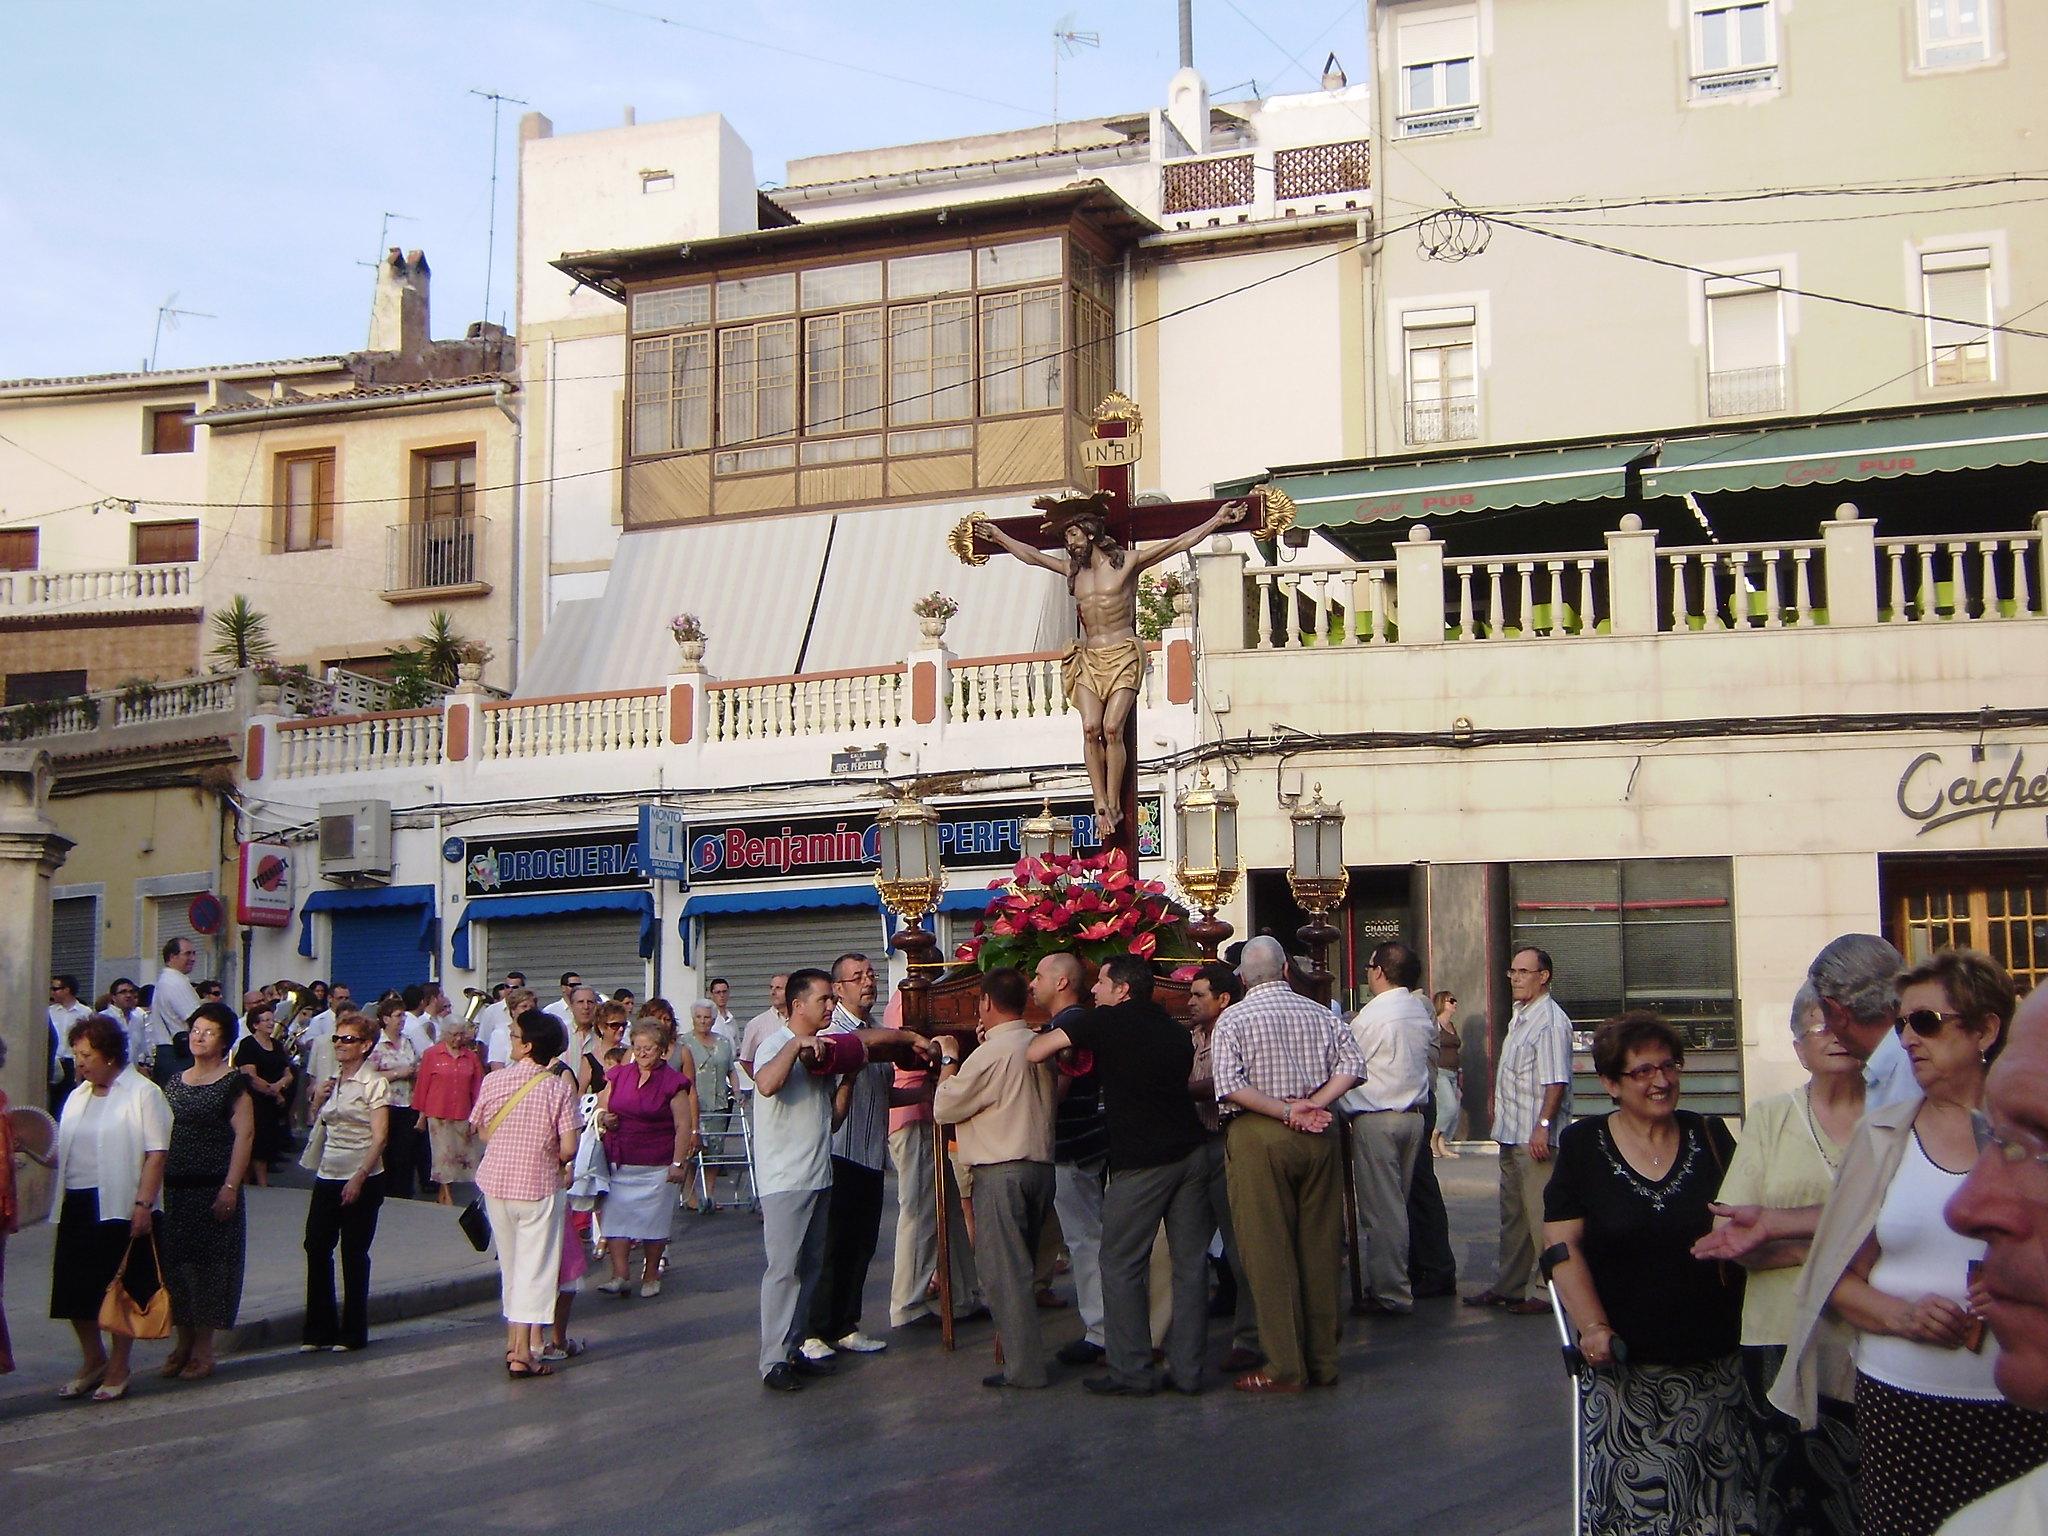 (2009-07-05) - Procesión Subida - Javier Romero Ripoll - (07)